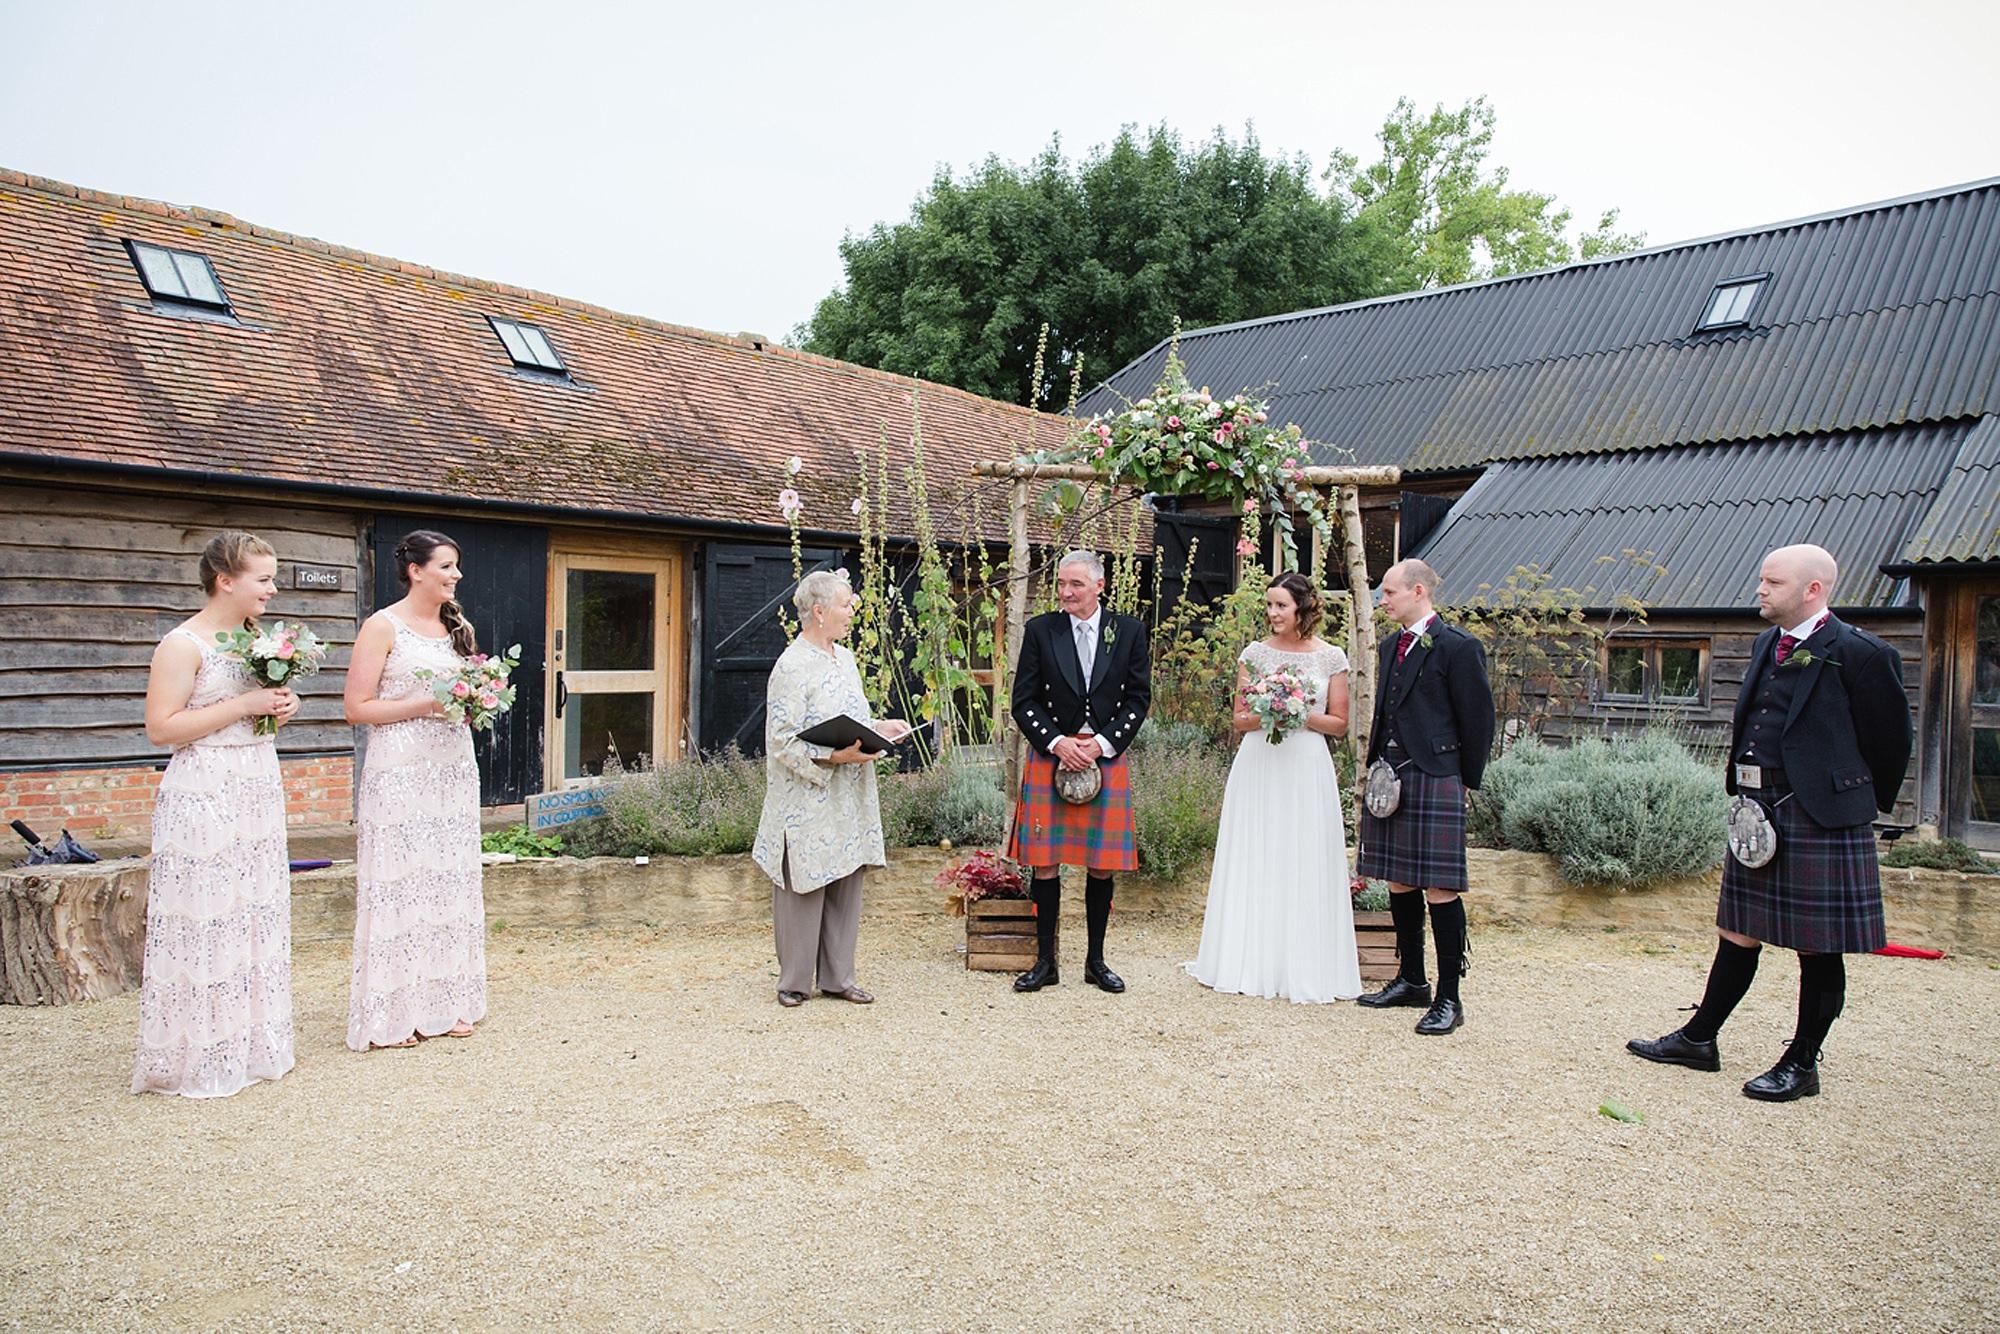 outdoor humanist wedding photography ceremony